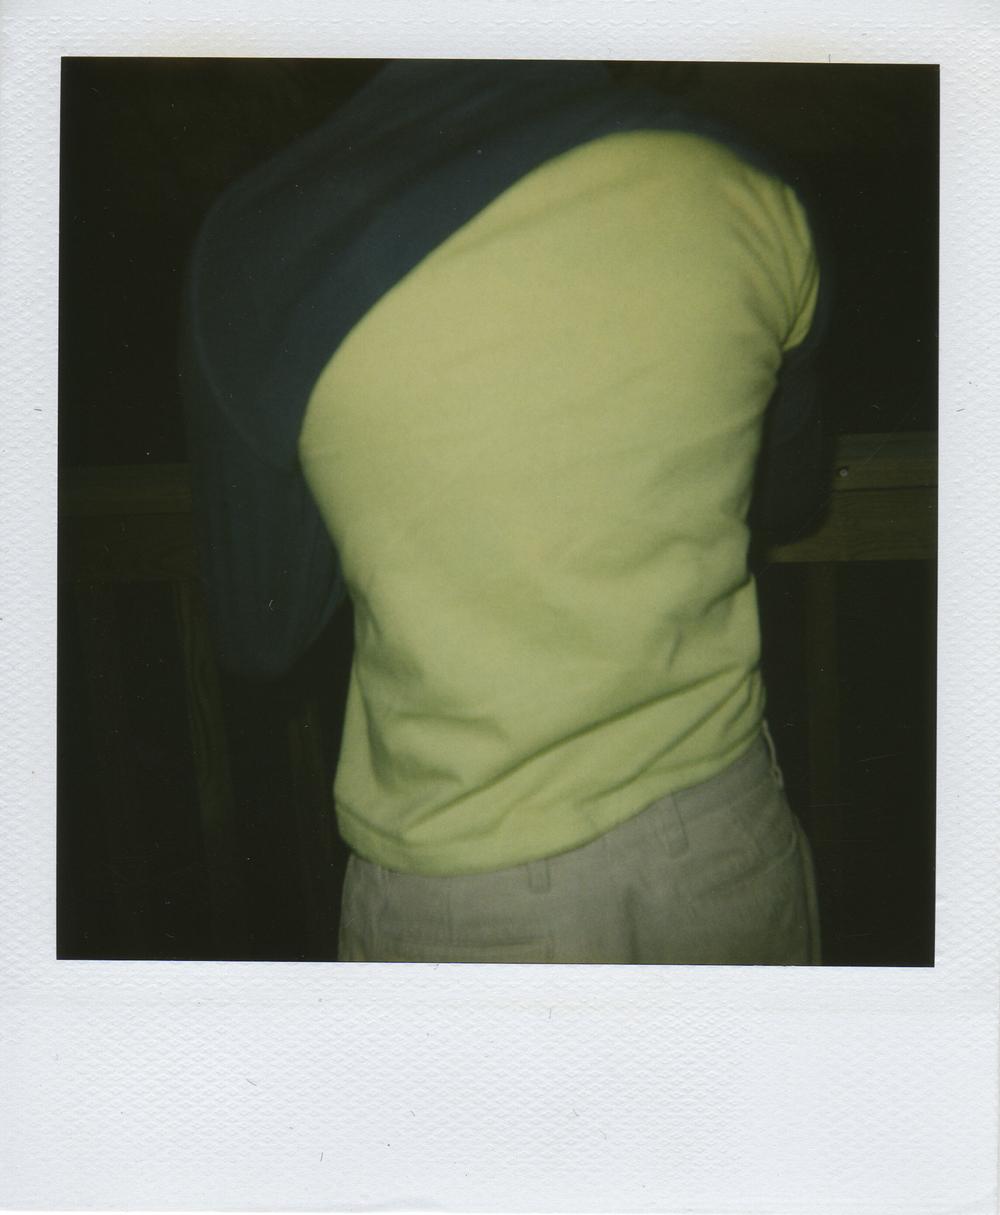 jlaurence-polaroid-017.jpg